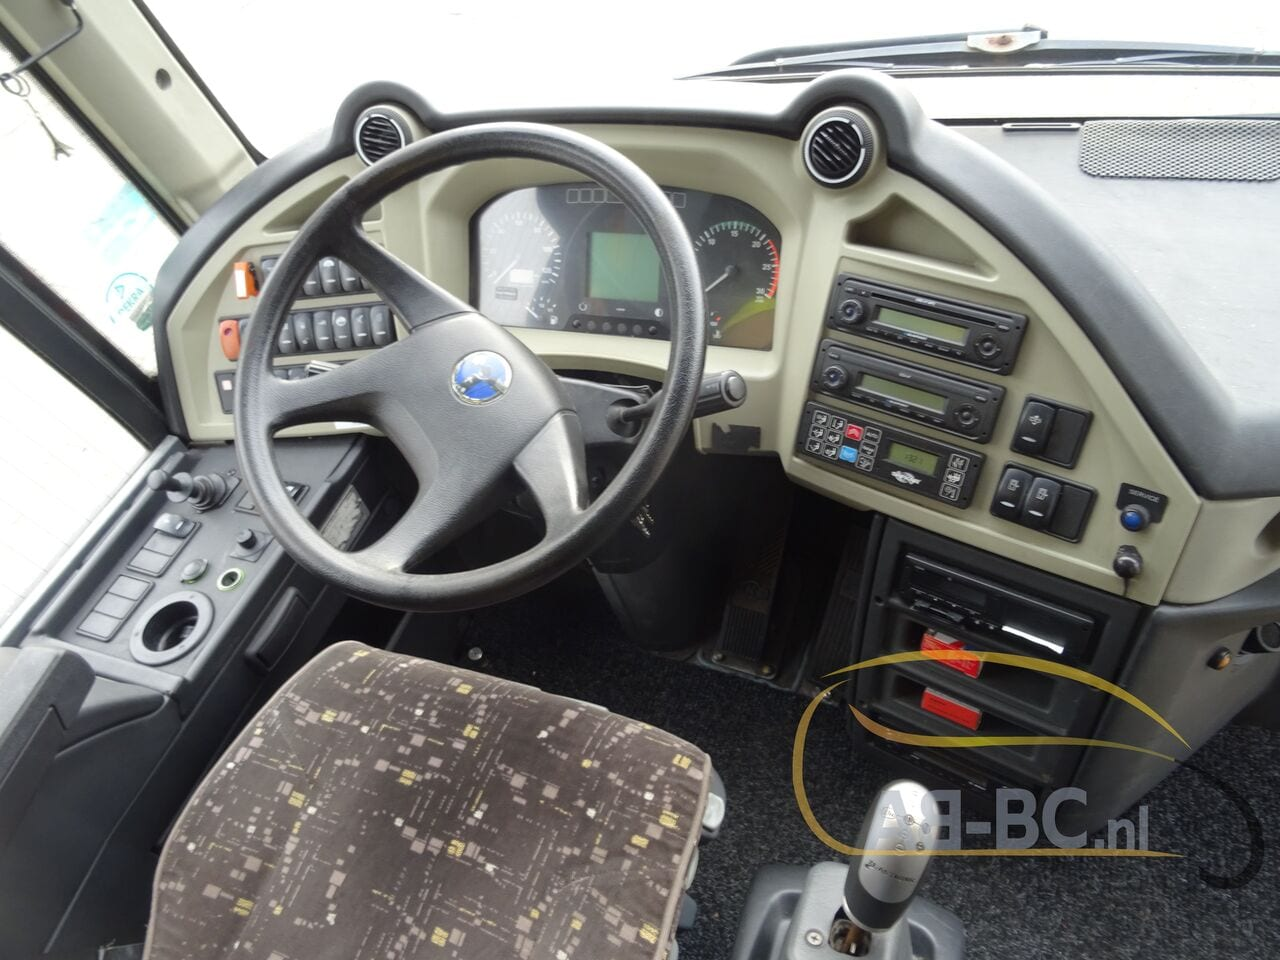 coach-busTEMSA-Safari-HD-51-Seats-EURO5-12-MTR---1614266490384152178_big_52bba553fe10335db143c6f85bcc0507--19052917224730818200